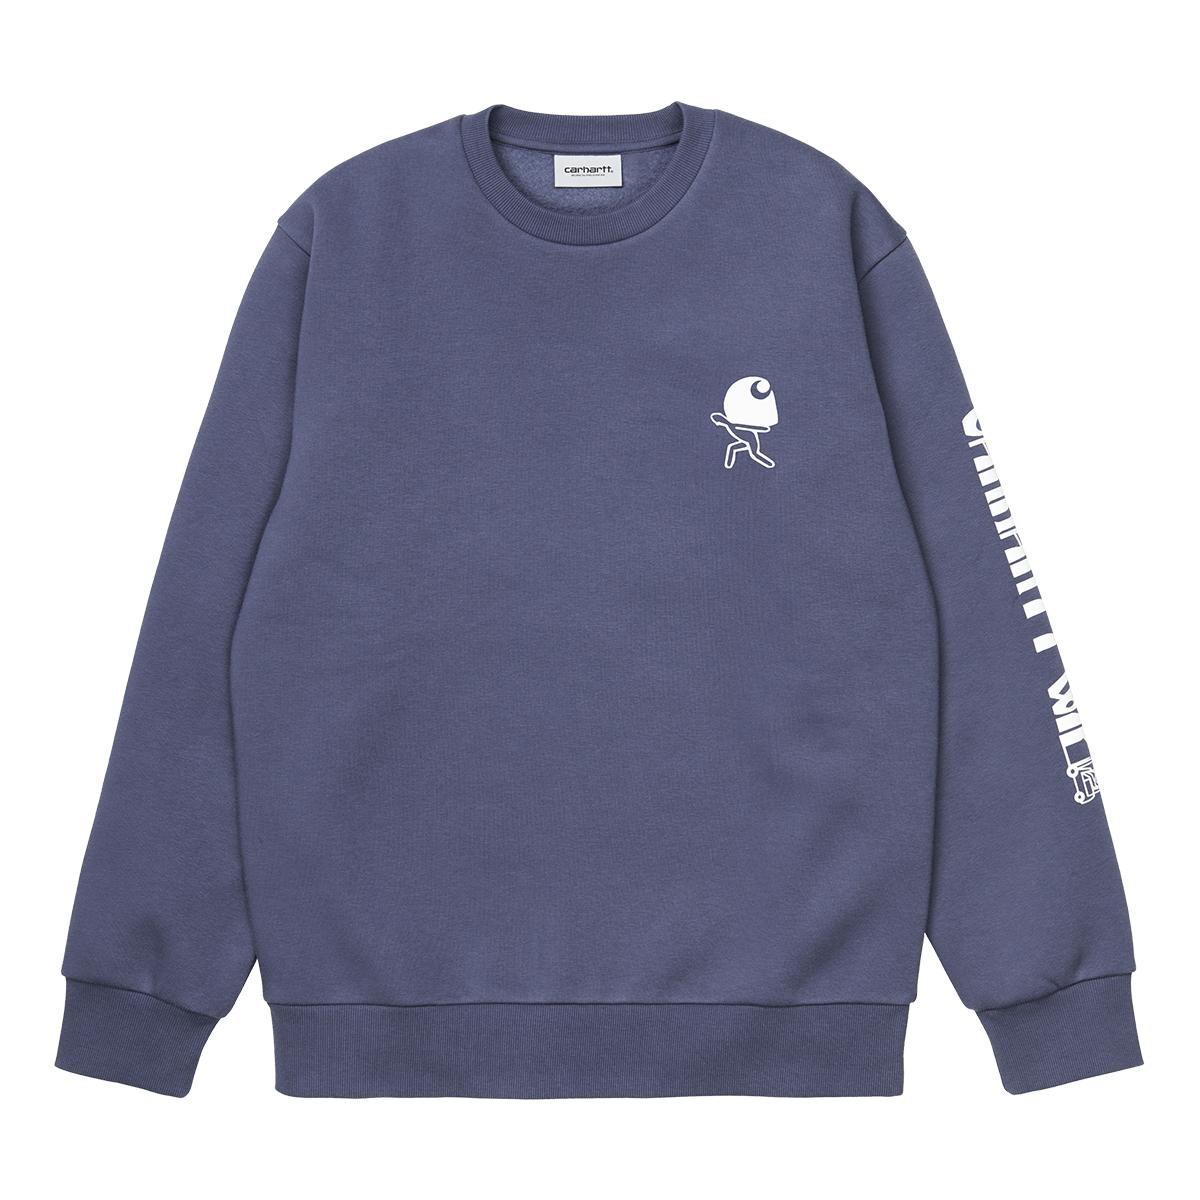 Removals Sweatshirt